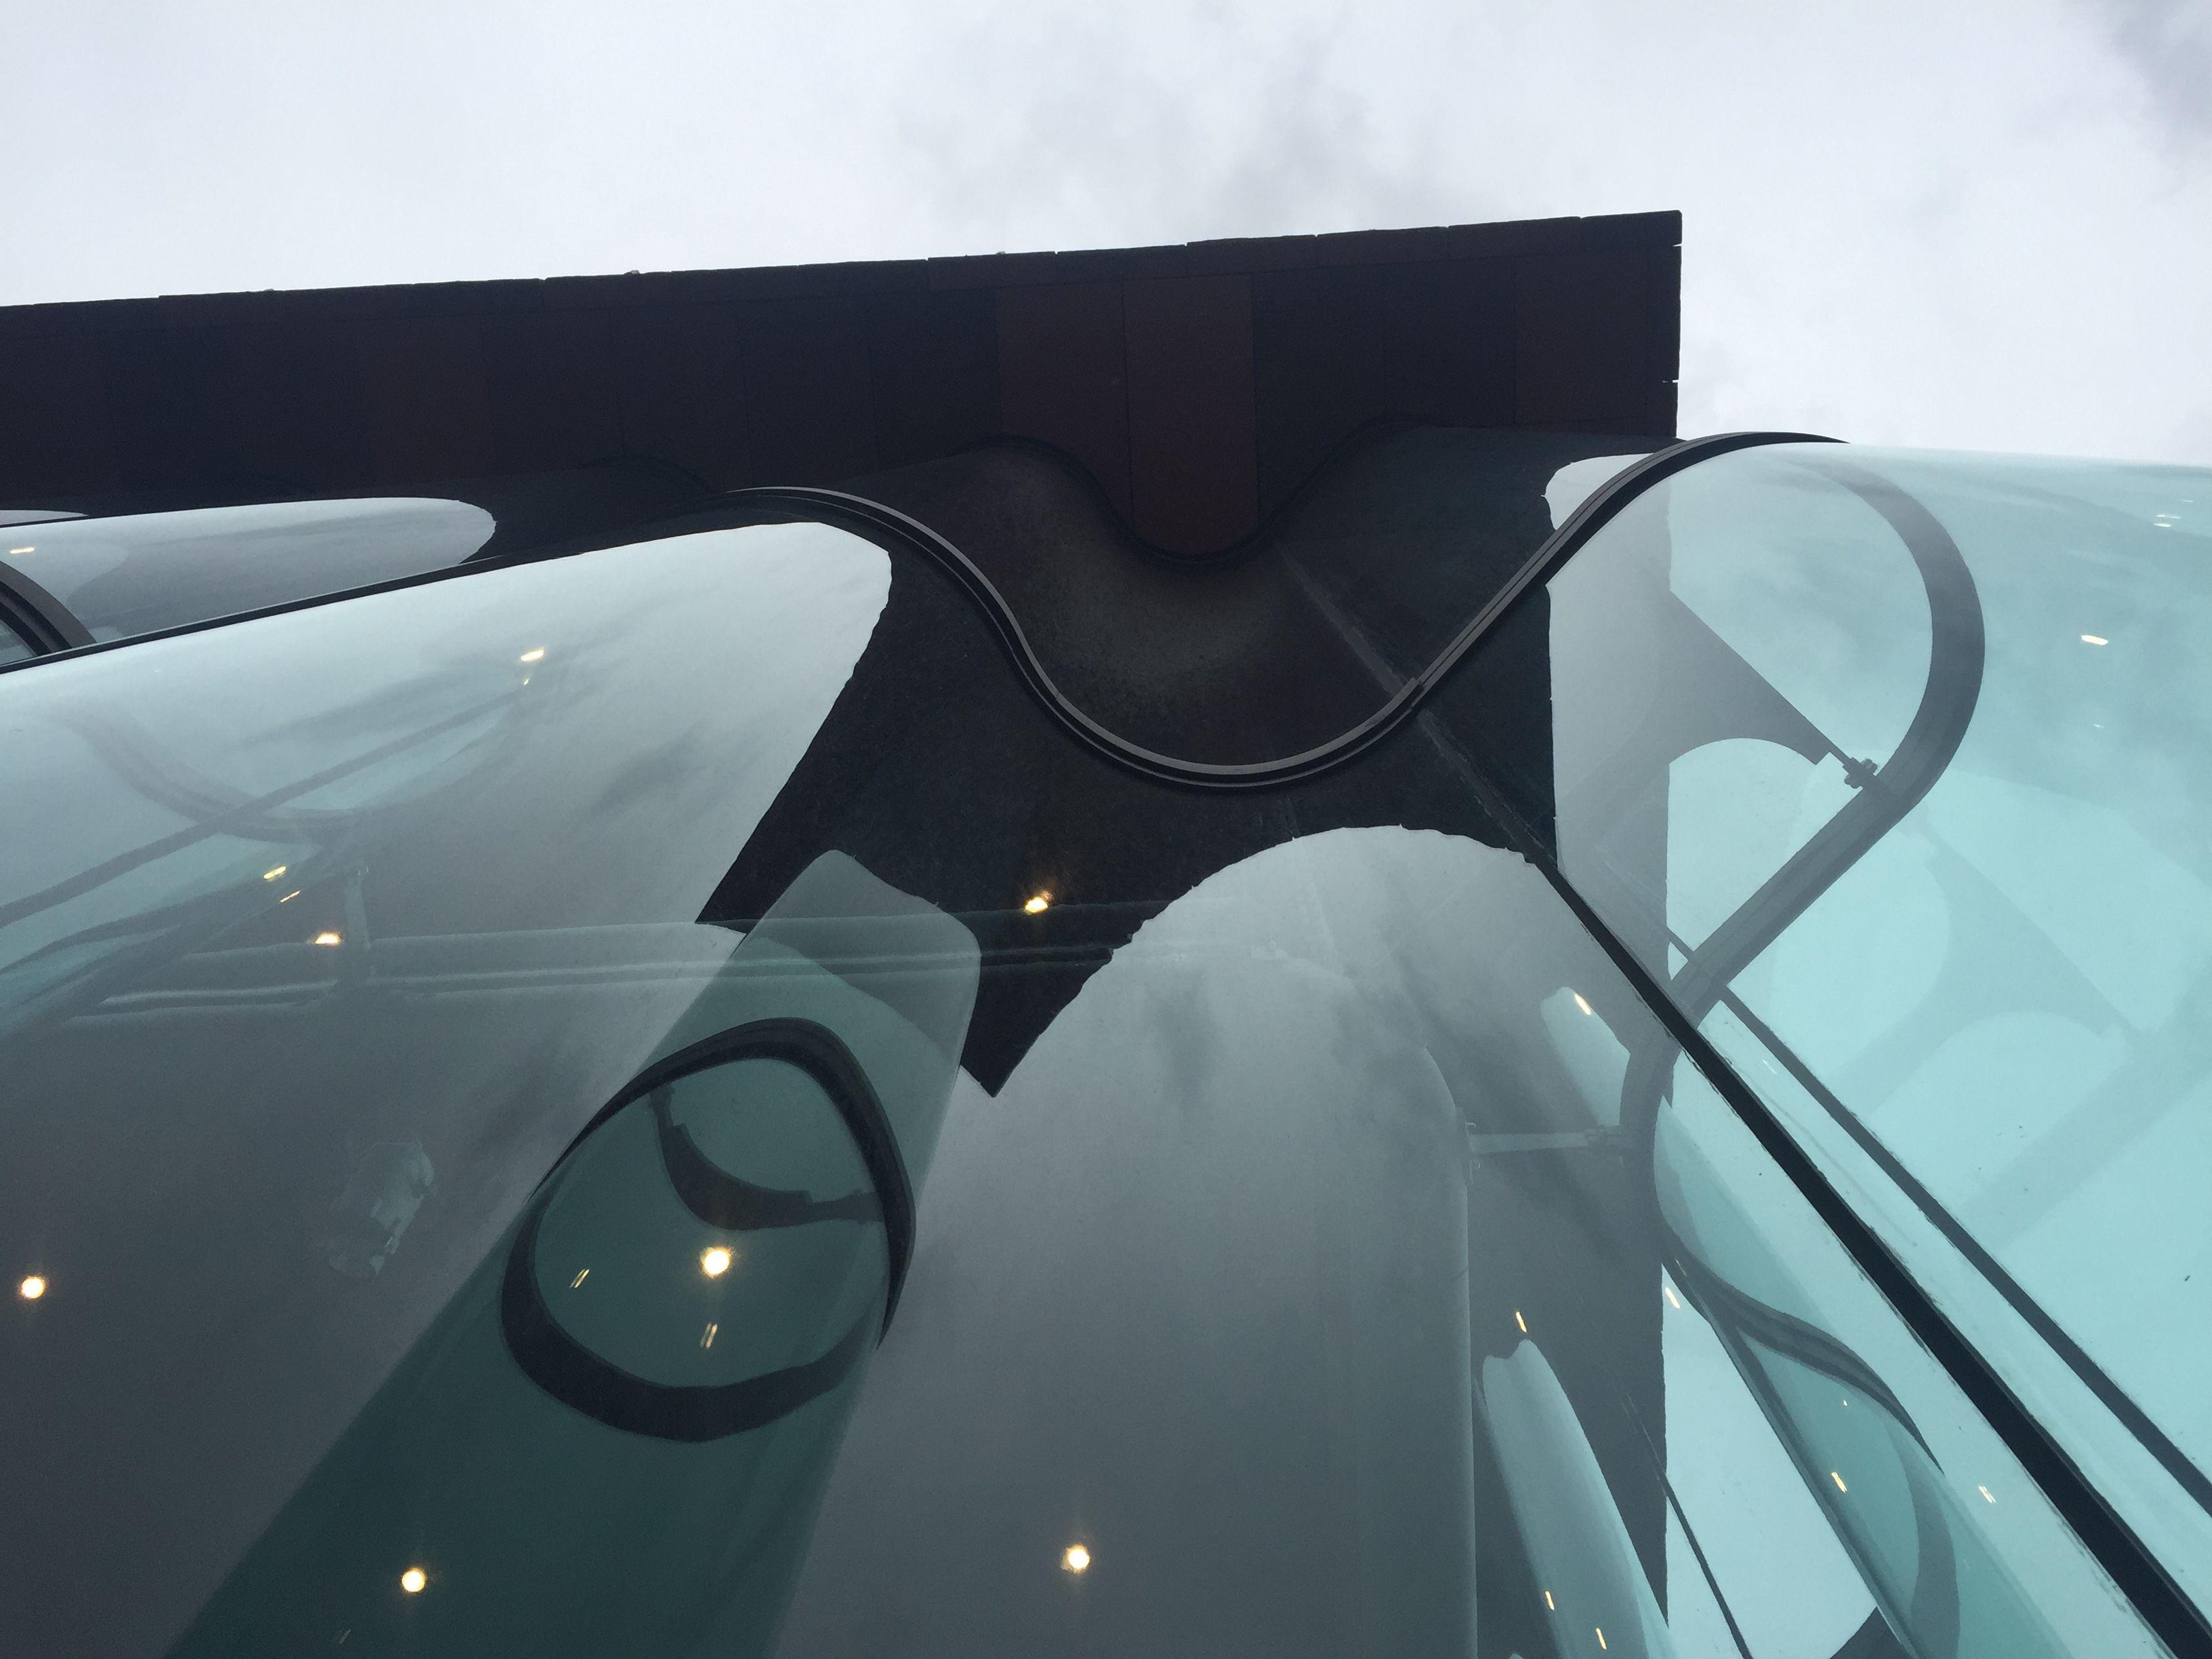 Curved Glass Facade, Antwerp